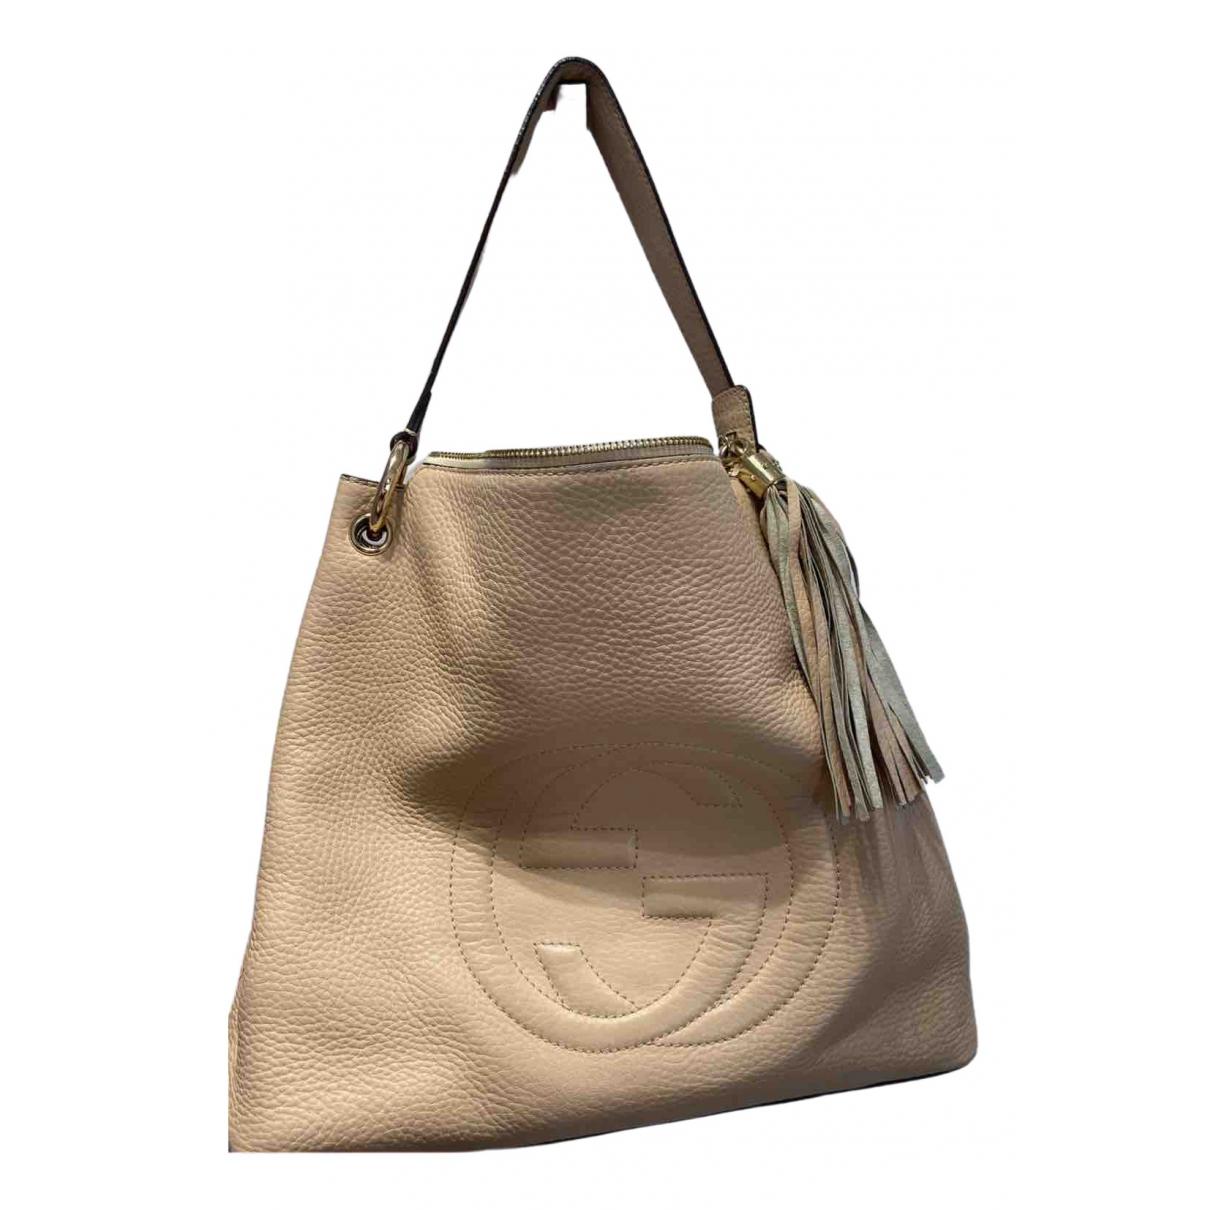 Gucci Soho Handtasche in  Beige Leder